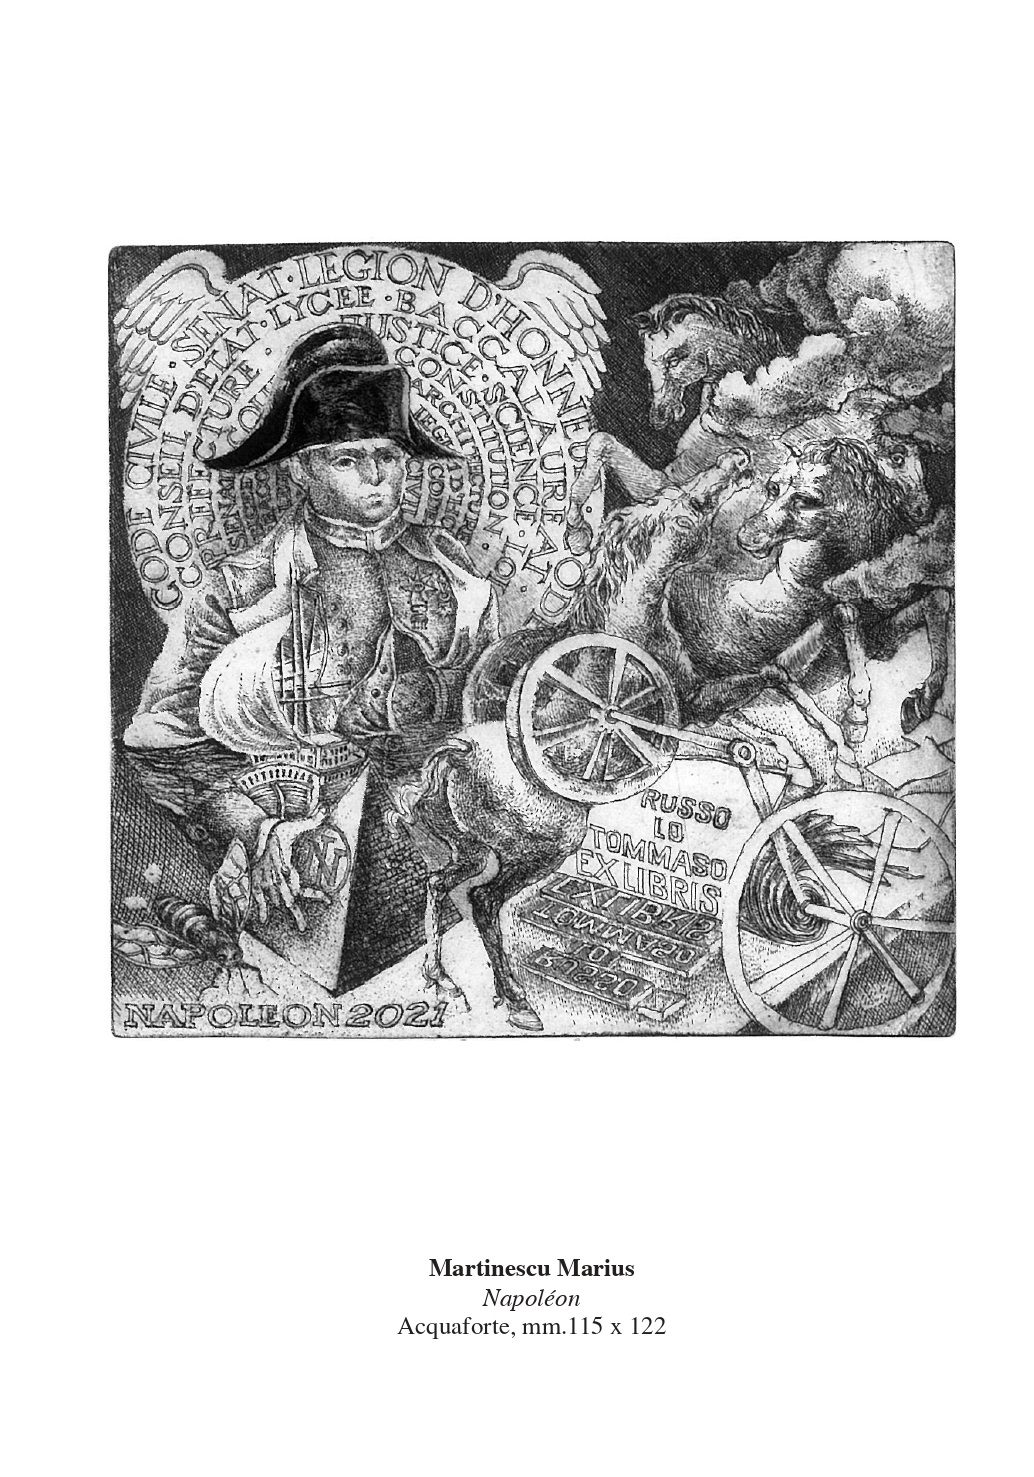 CATALOGO exlibris 2021-104_page-0001